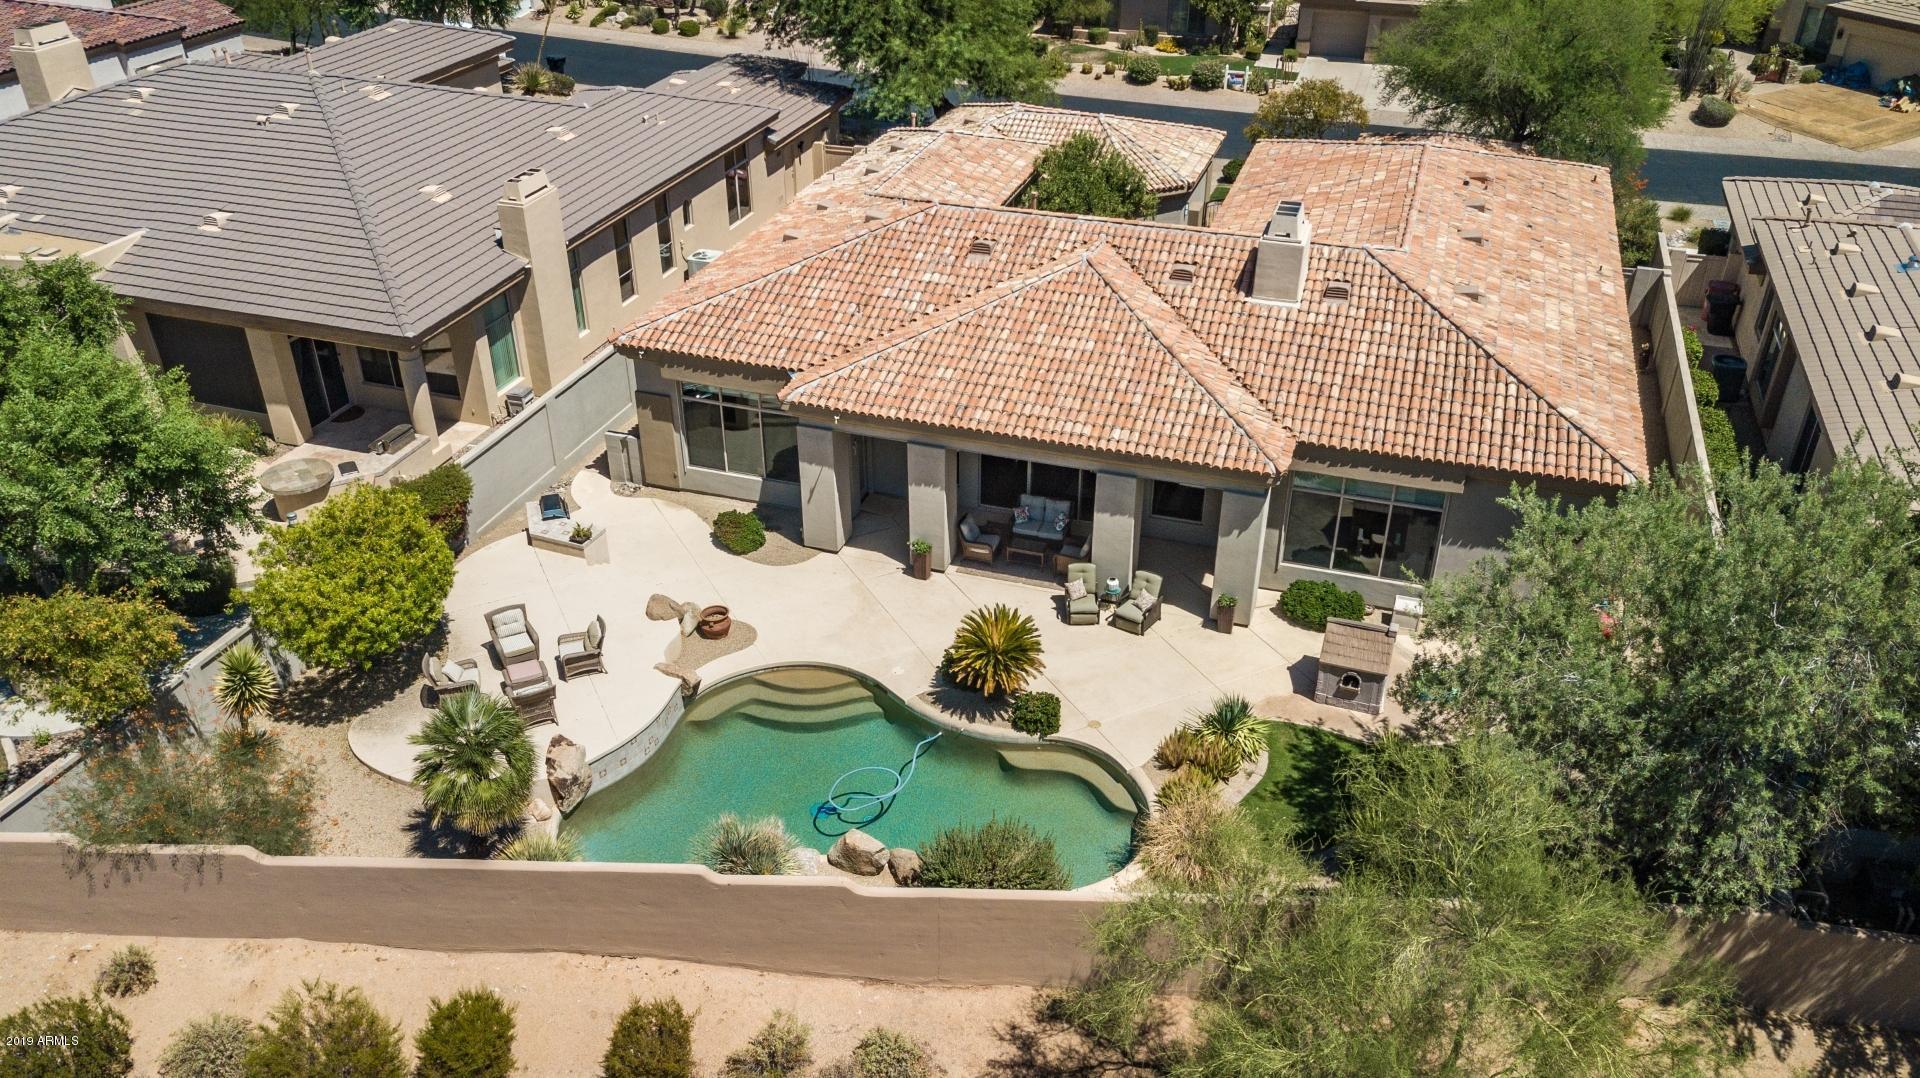 MLS 5967670 20626 N 83RD Place, Scottsdale, AZ 85255 Scottsdale AZ Grayhawk